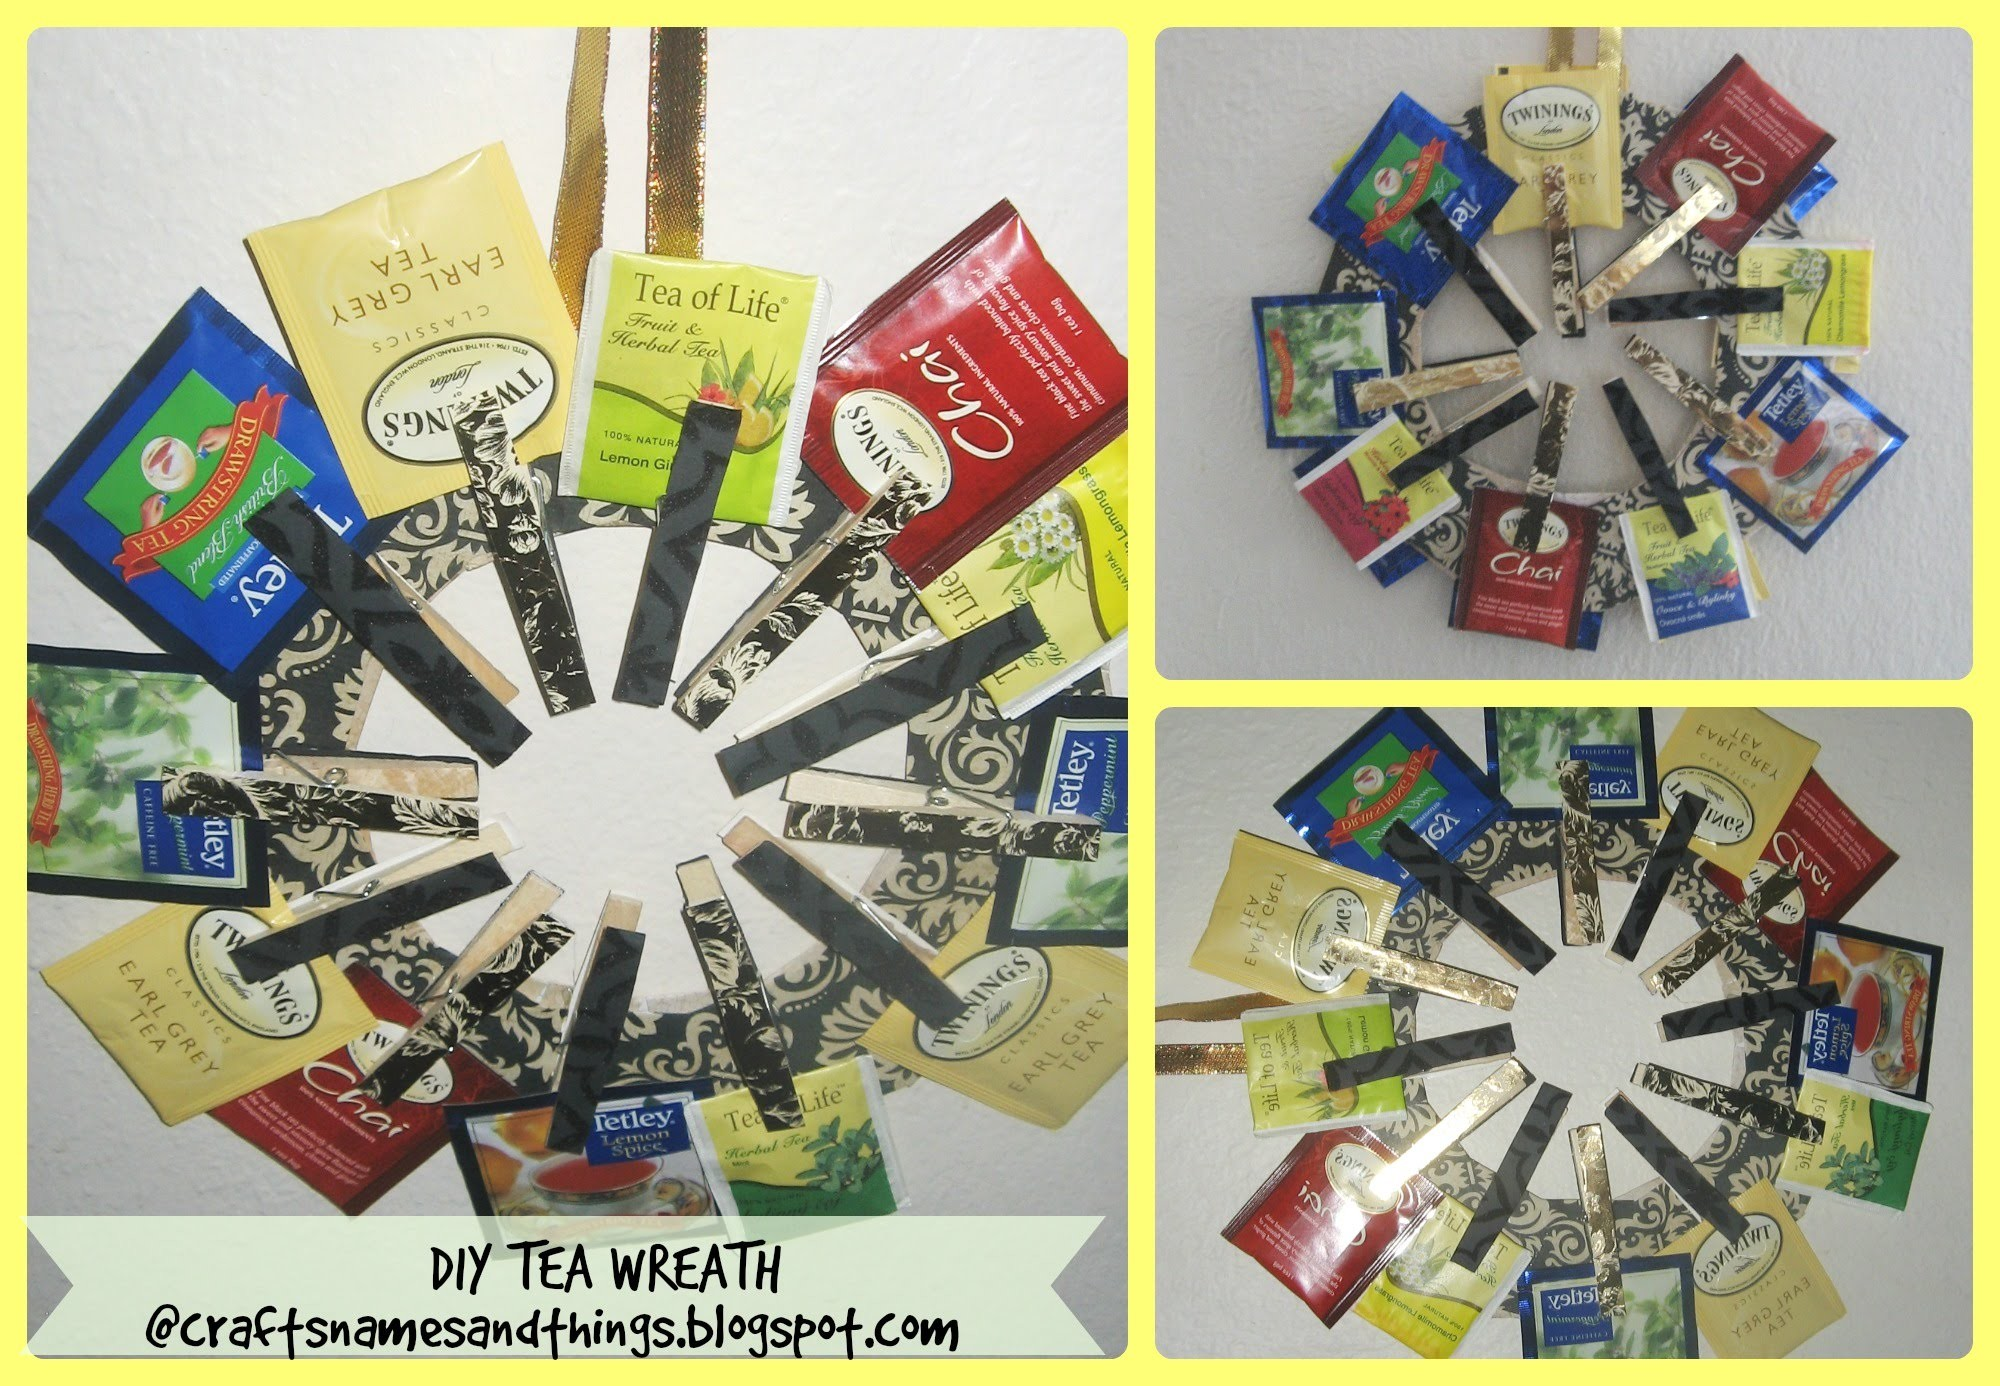 DIY Gifts Under $10. DIY Tea Wreath. How to make a Tea Wreath. tutorial - How to-